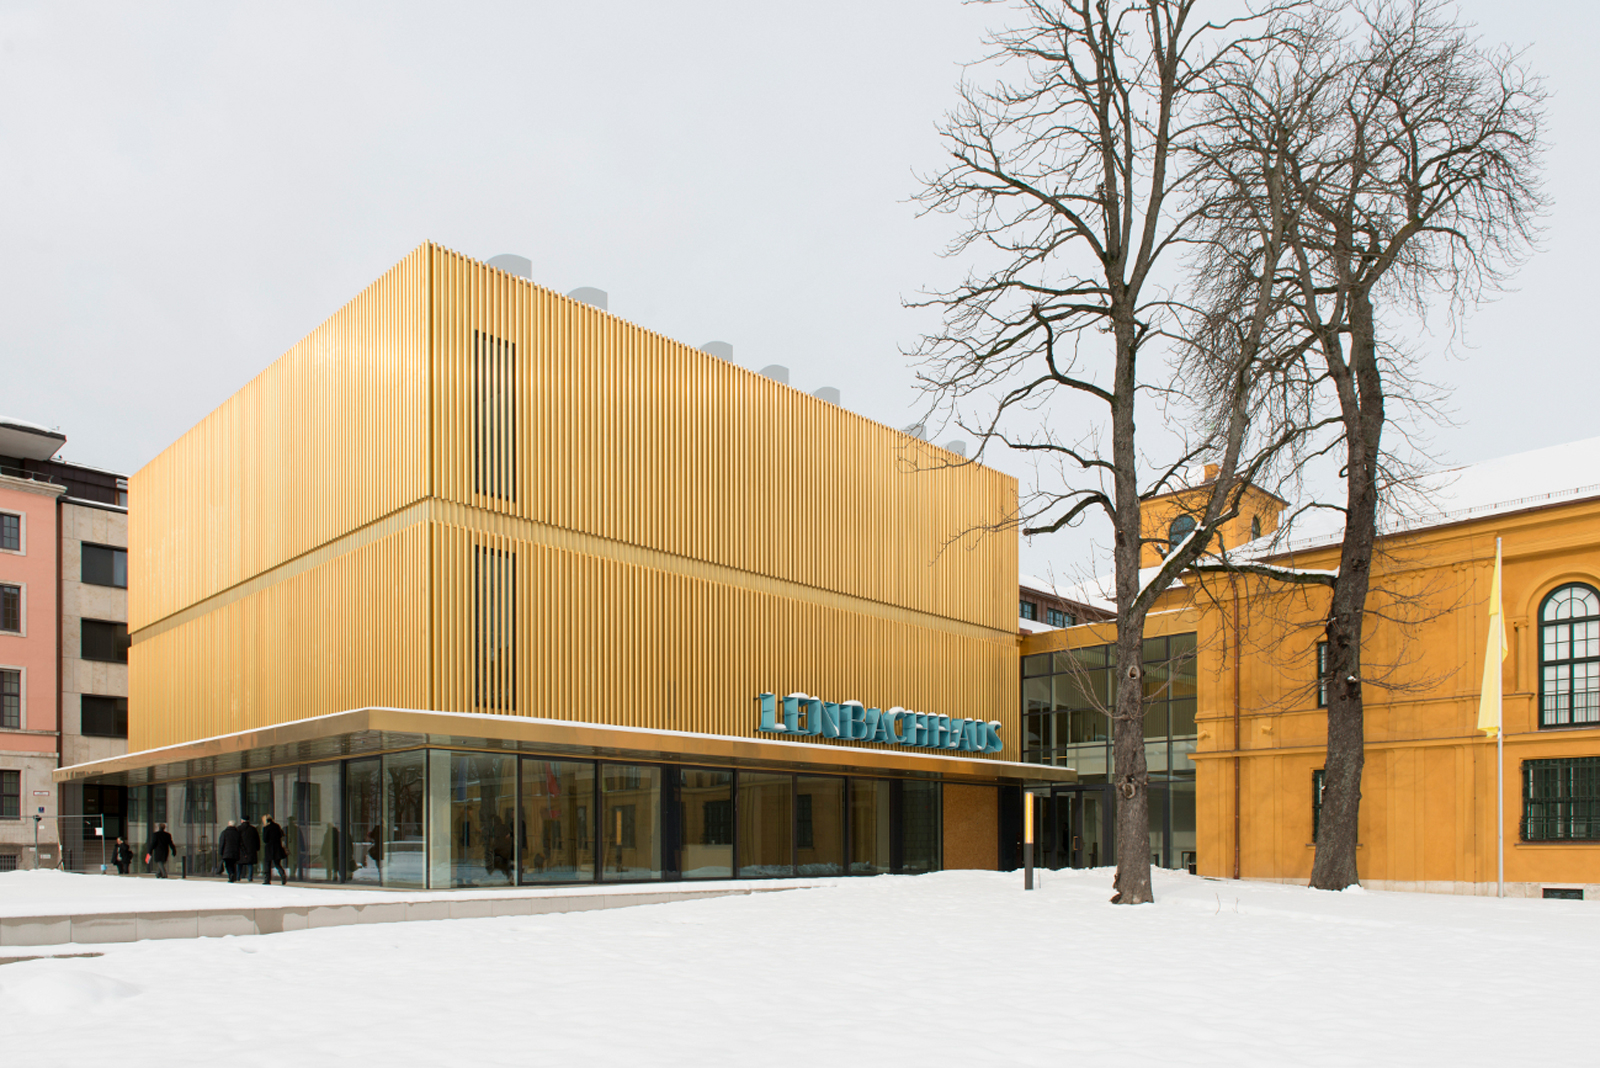 Lenbachhaus Museum in Munich